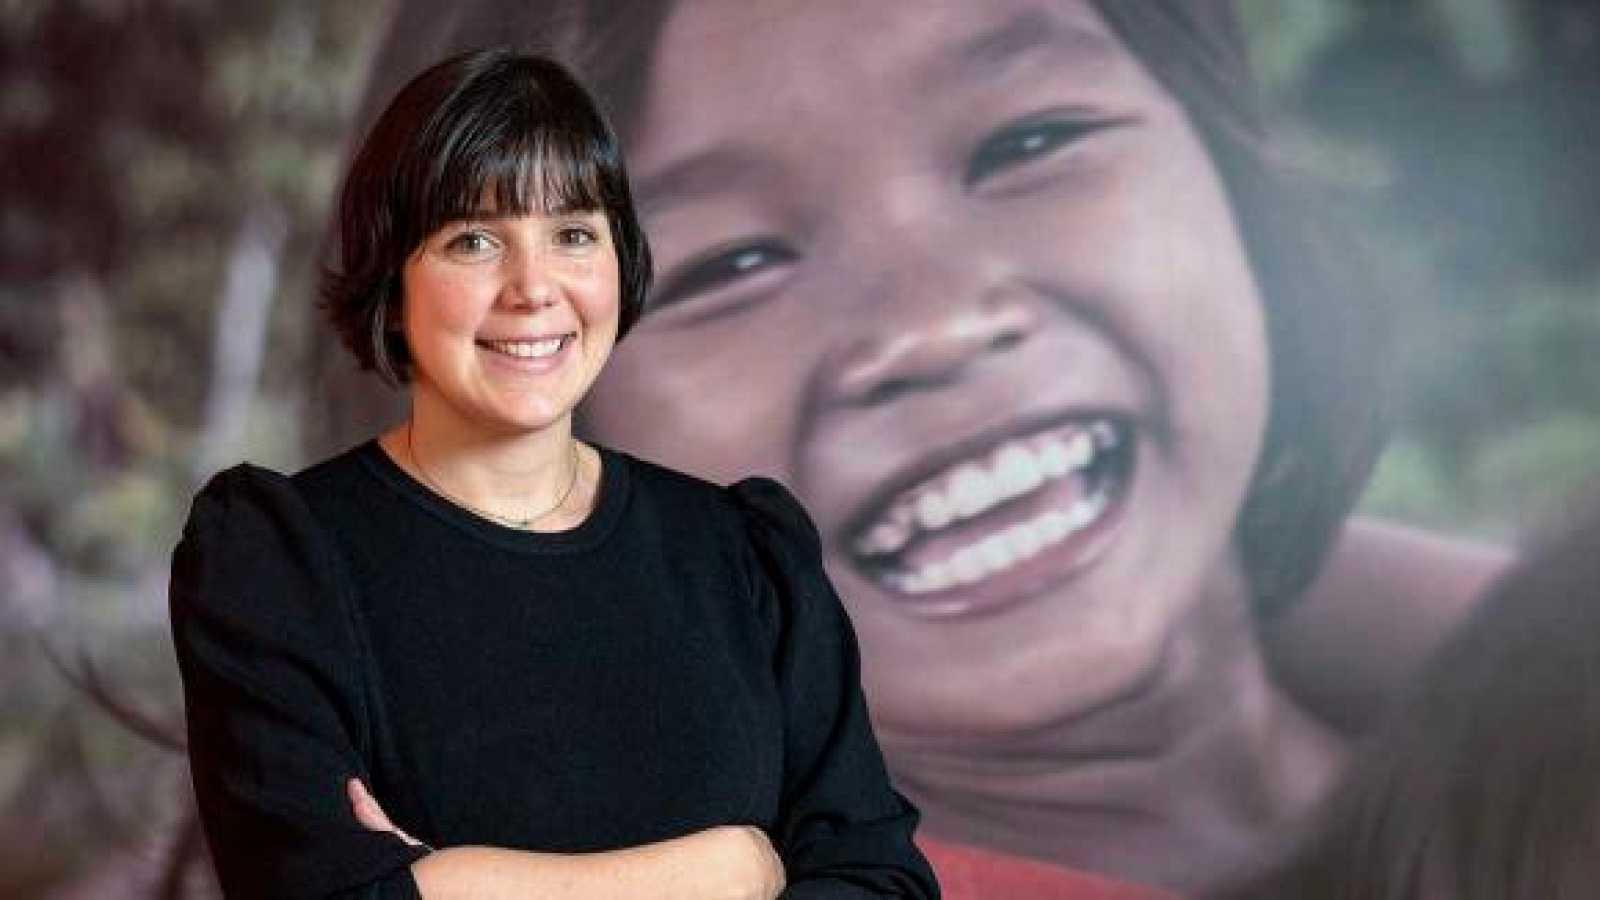 La entrevista de Radio 5 - Catalina Perazzo 'Save the children' - 07/10/20 - Escuchar ahora